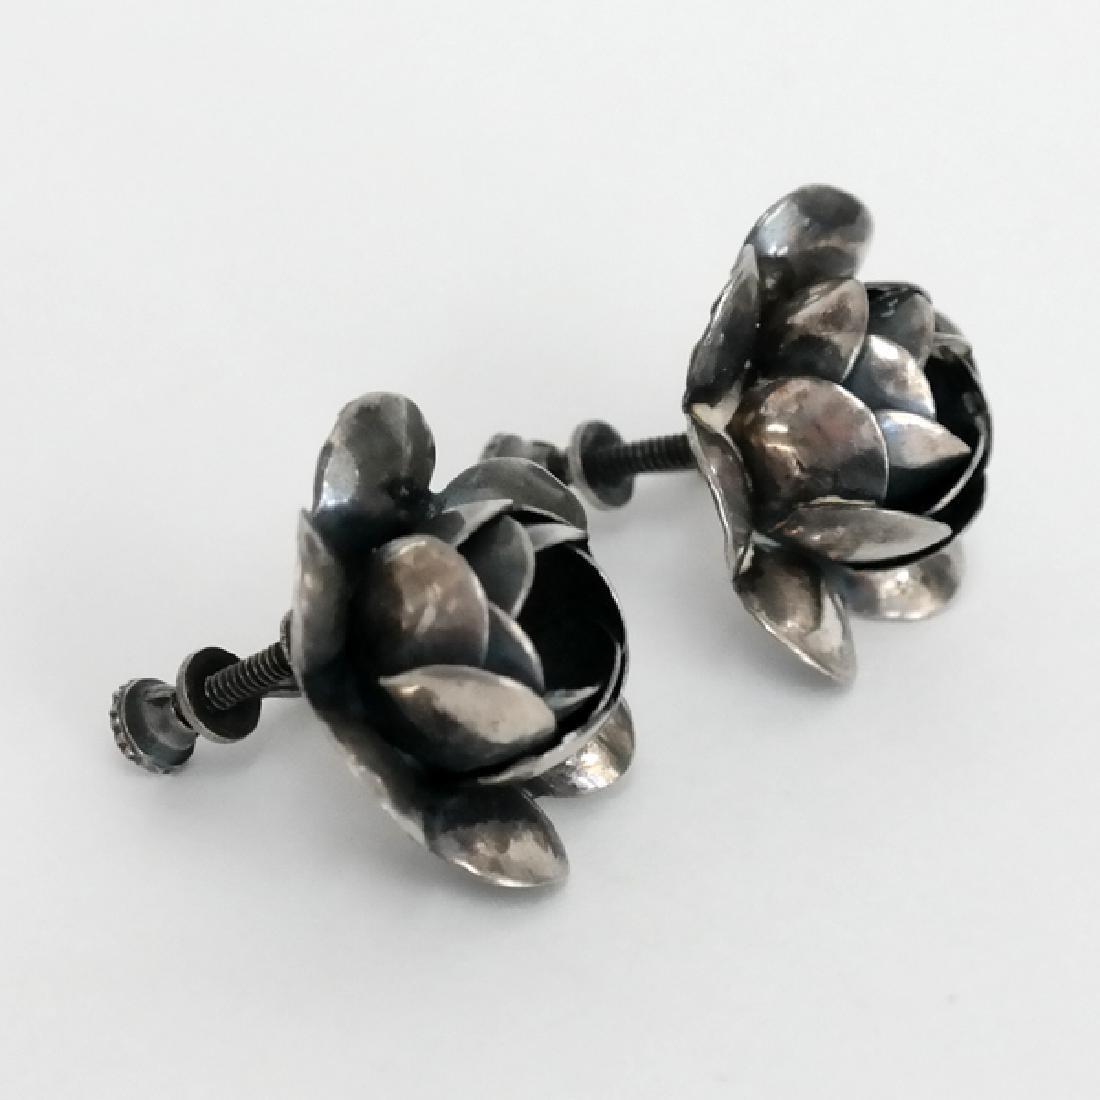 Vintage oxidised sterling silver rose shape ear clips - 3